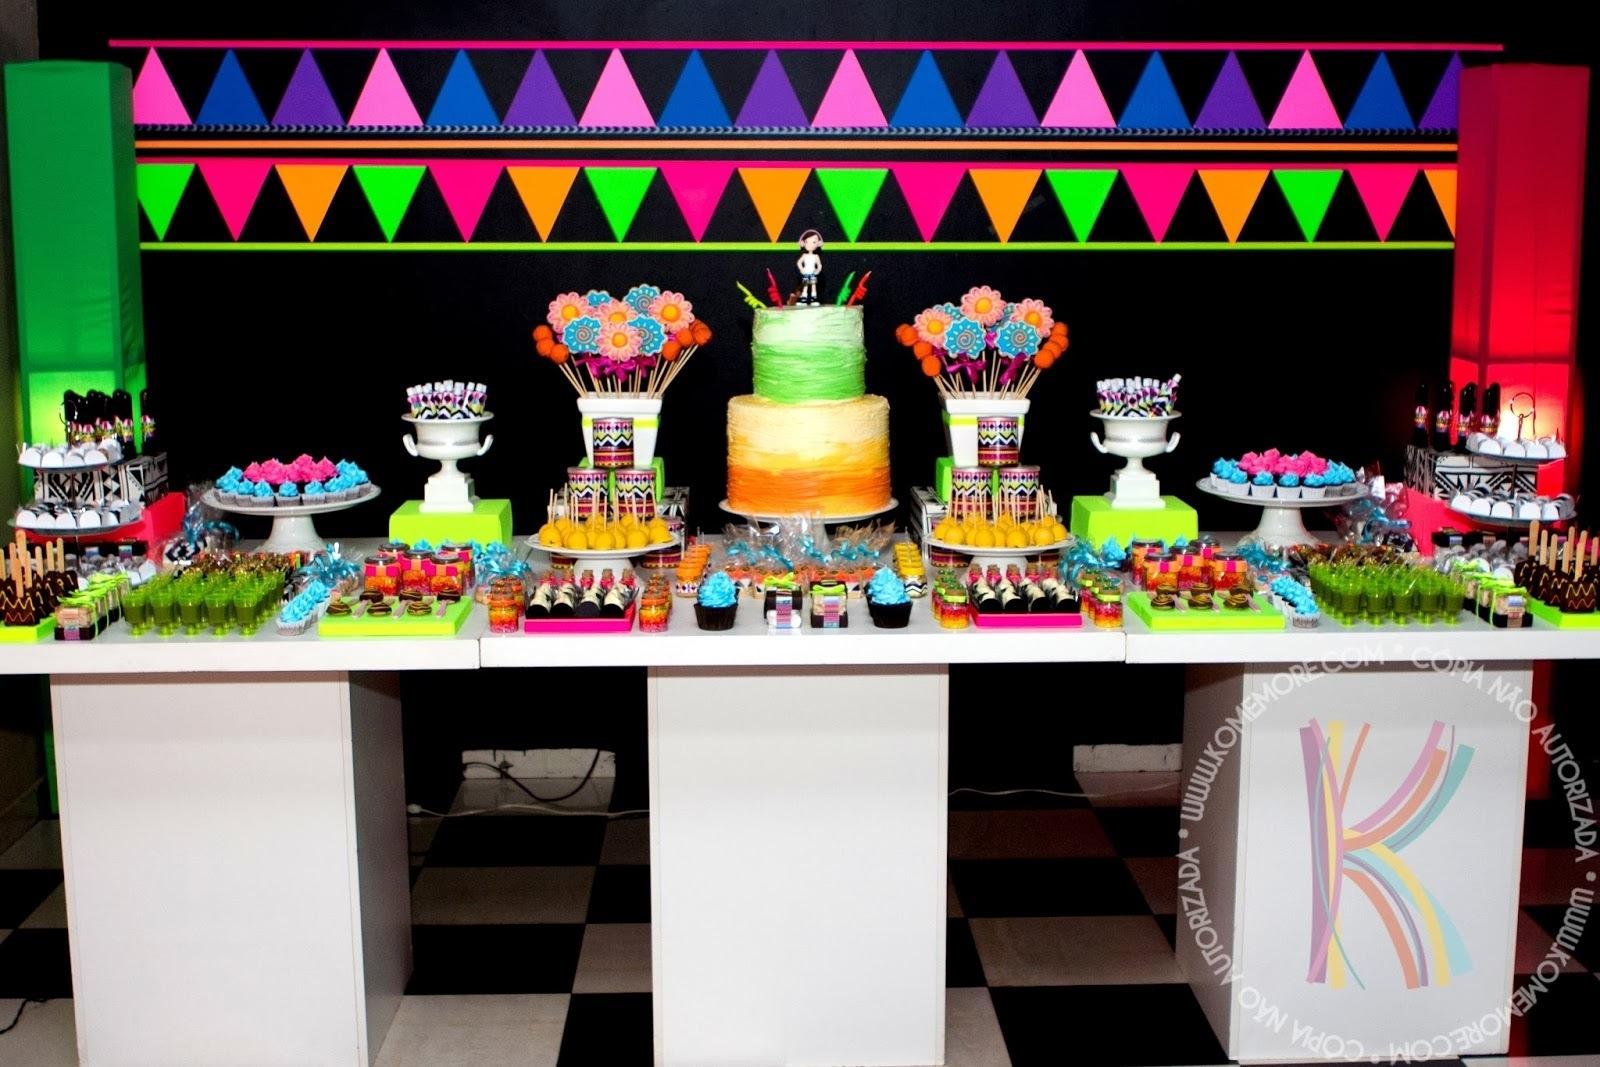 decoracao festa glow:Dicas e Ideias para Festas: Festa Neon